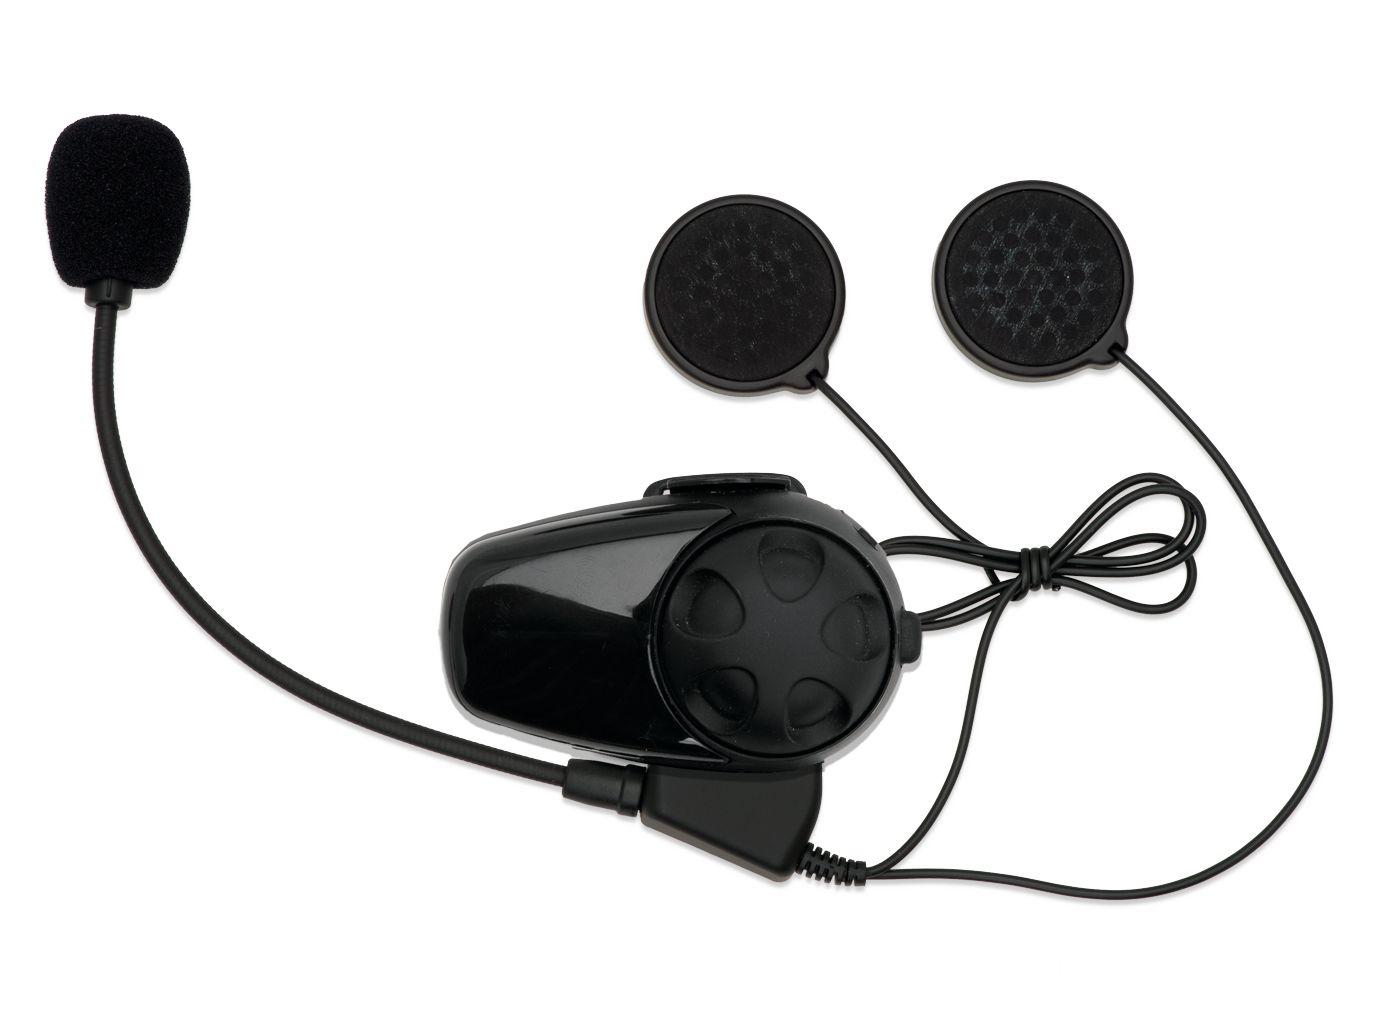 316bc2226ad Bell Mag-9 / Qualifier DLX Sena SMH-10 Bluetooth Headset   25% ($52.96)  Off! - RevZilla